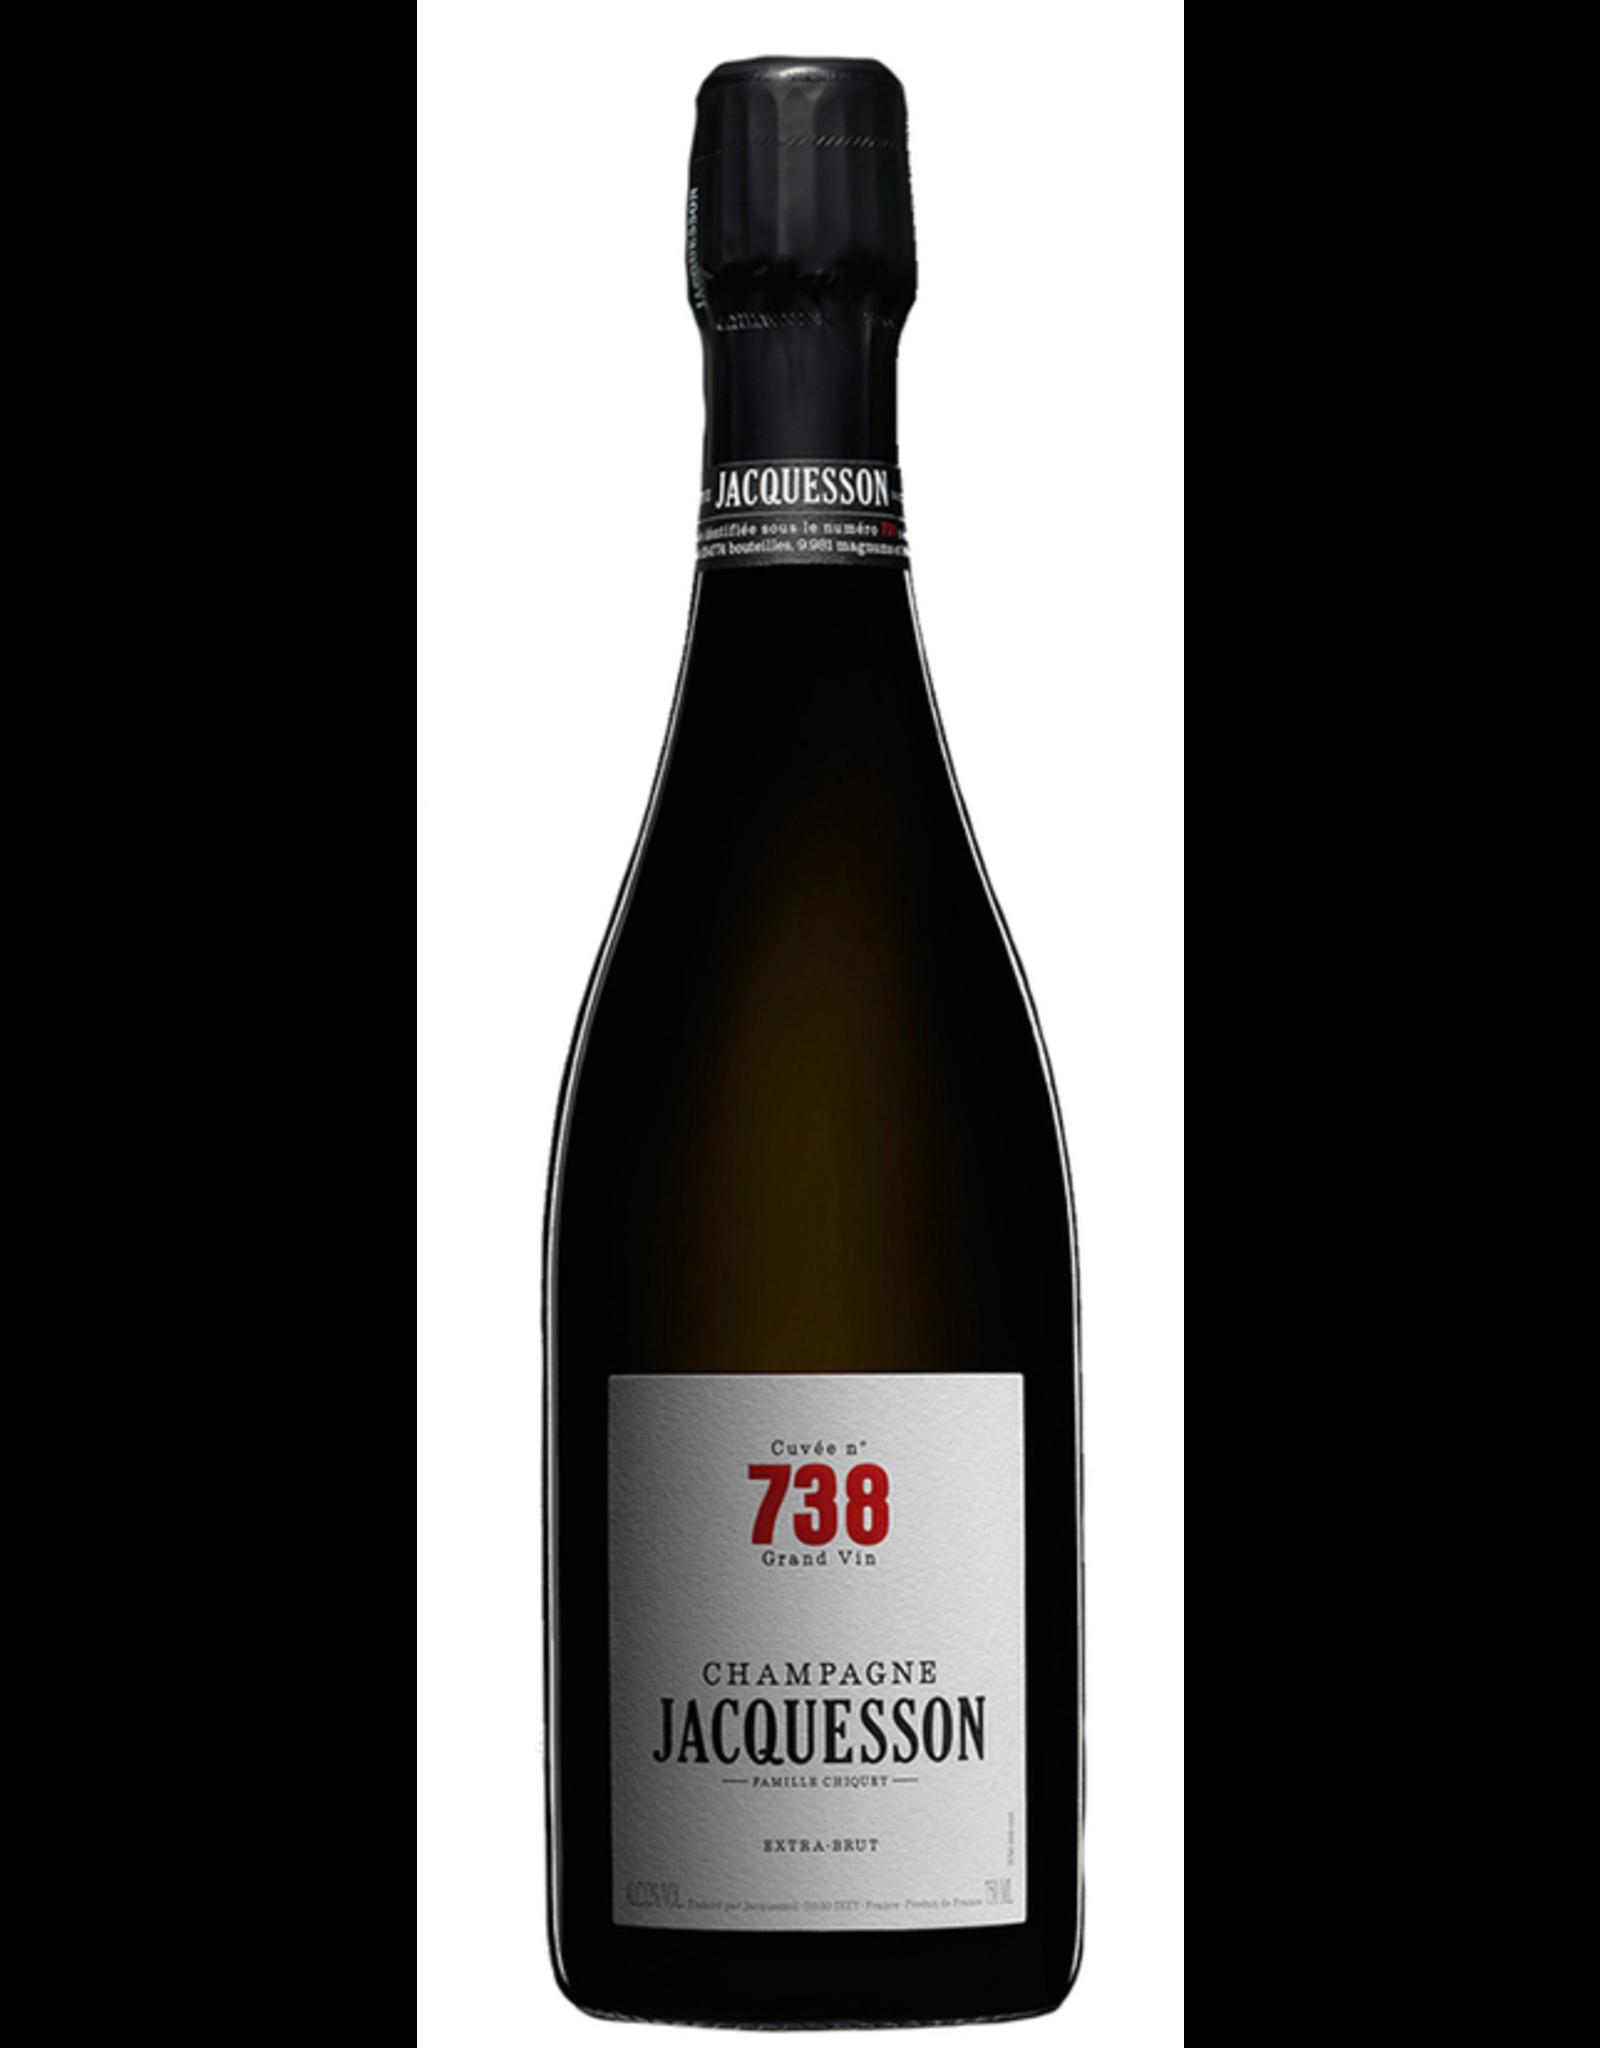 Sparkling Wine 2010, Jacquesson & Fils Champagne Cuvee No. 738 Extra Brut, Champagne Blend, Dizy, Champagne, France, 12% Alc, JS93